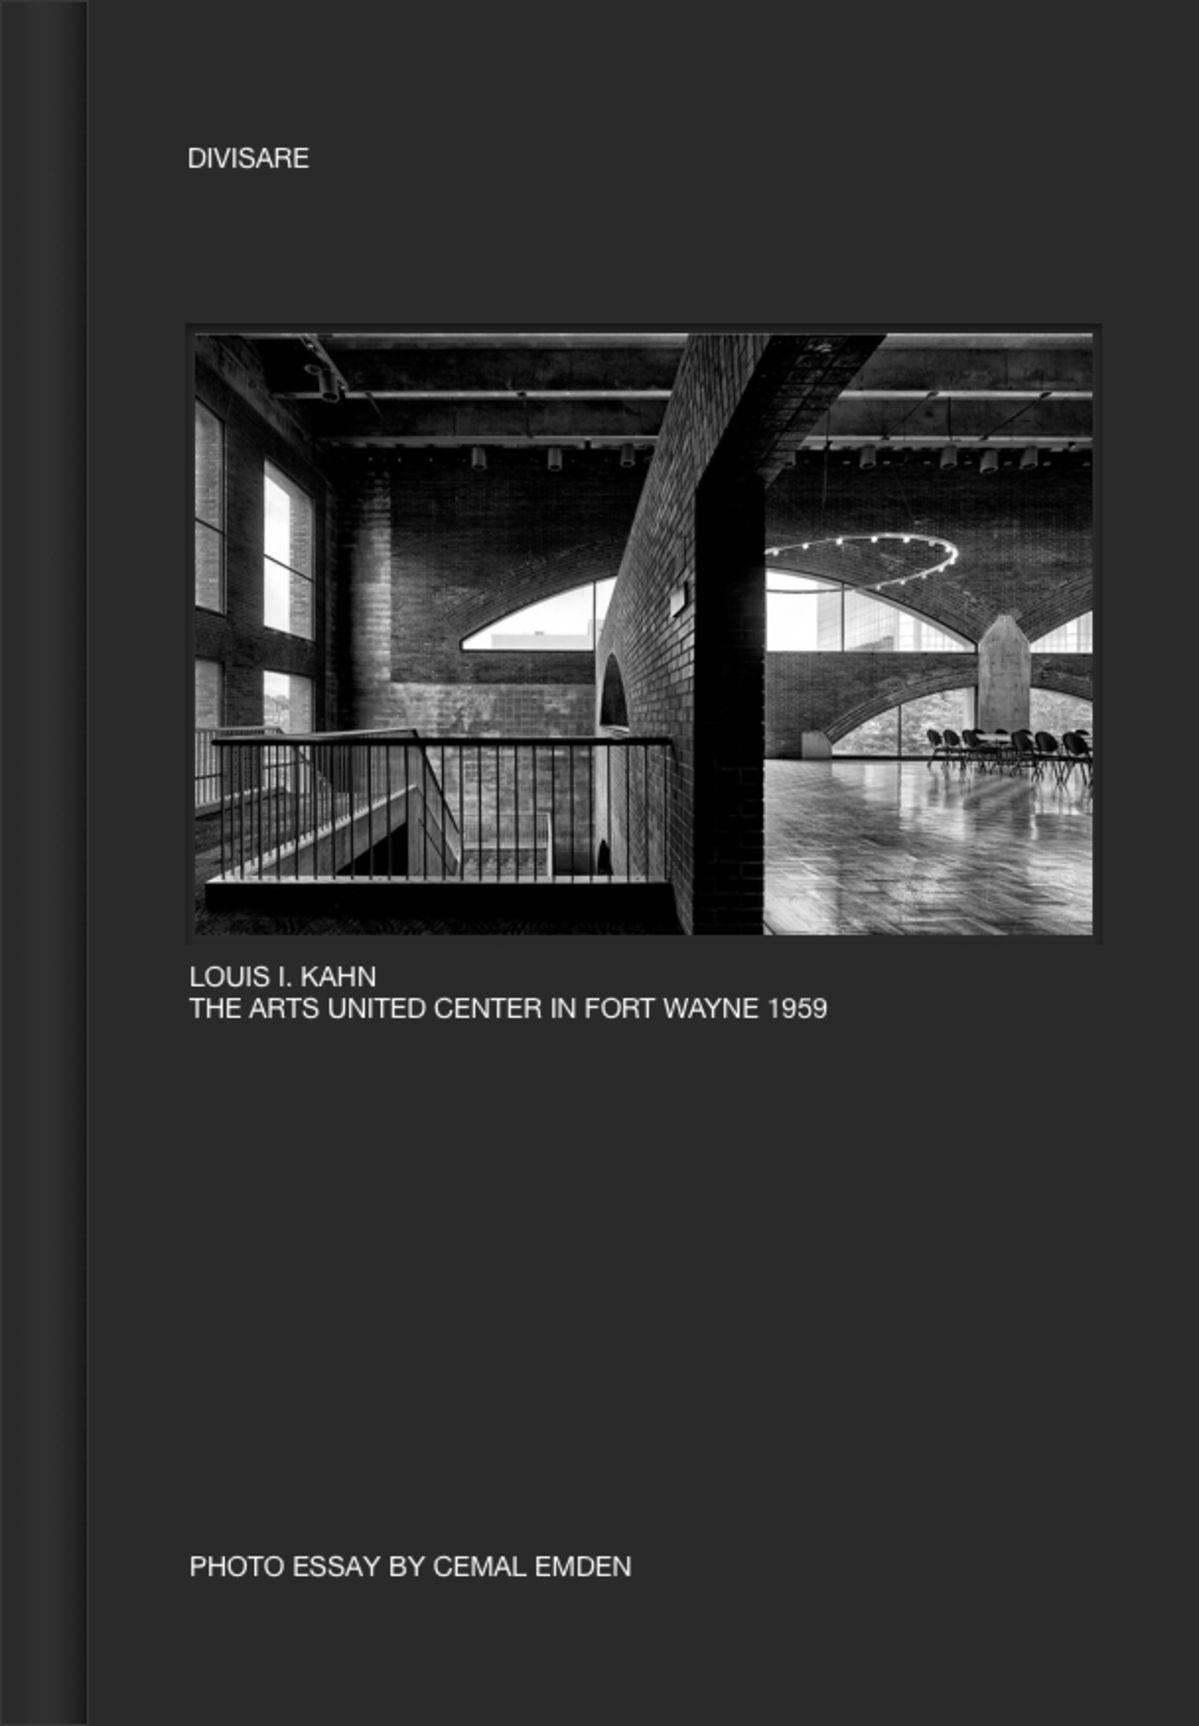 Louis I Kahn The Arts United Center In Fort Wayne 1959